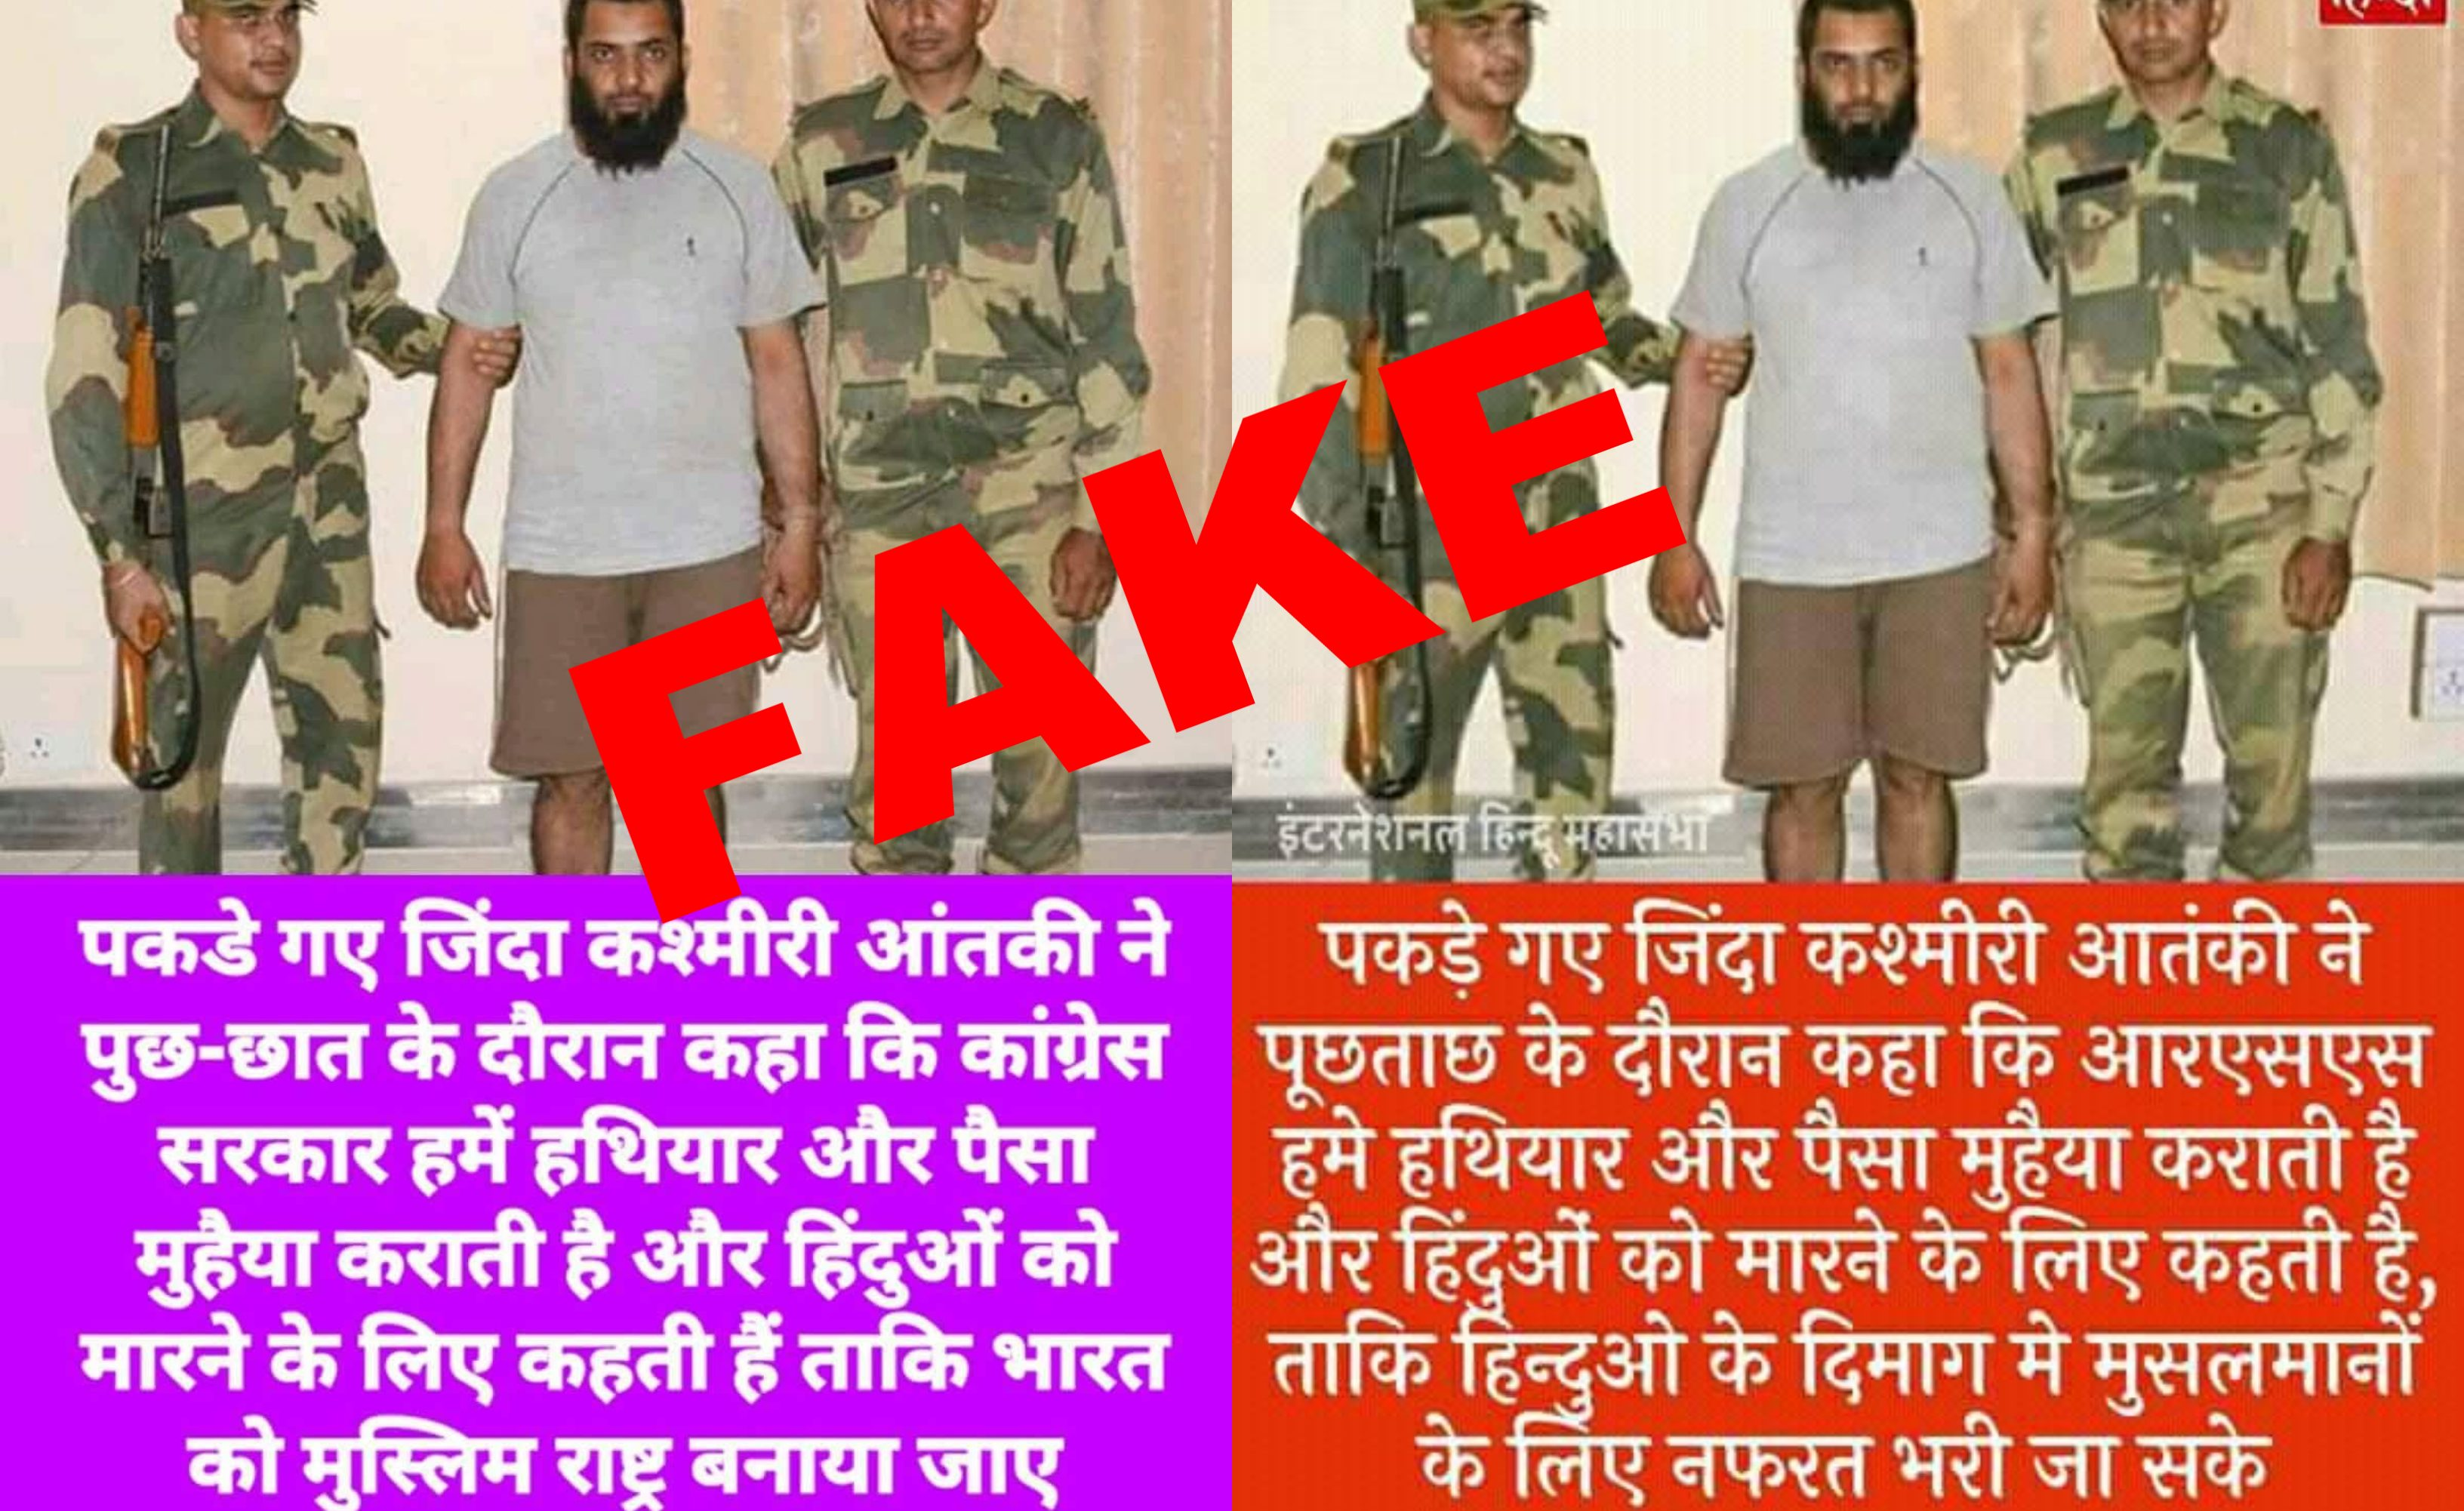 Abdul Qayum, Terrorist, Kashmir, Pakistan, Fake, News, Fact Check, Fact Checker, Fact, Check, NewsMobile, Mobile, News, India